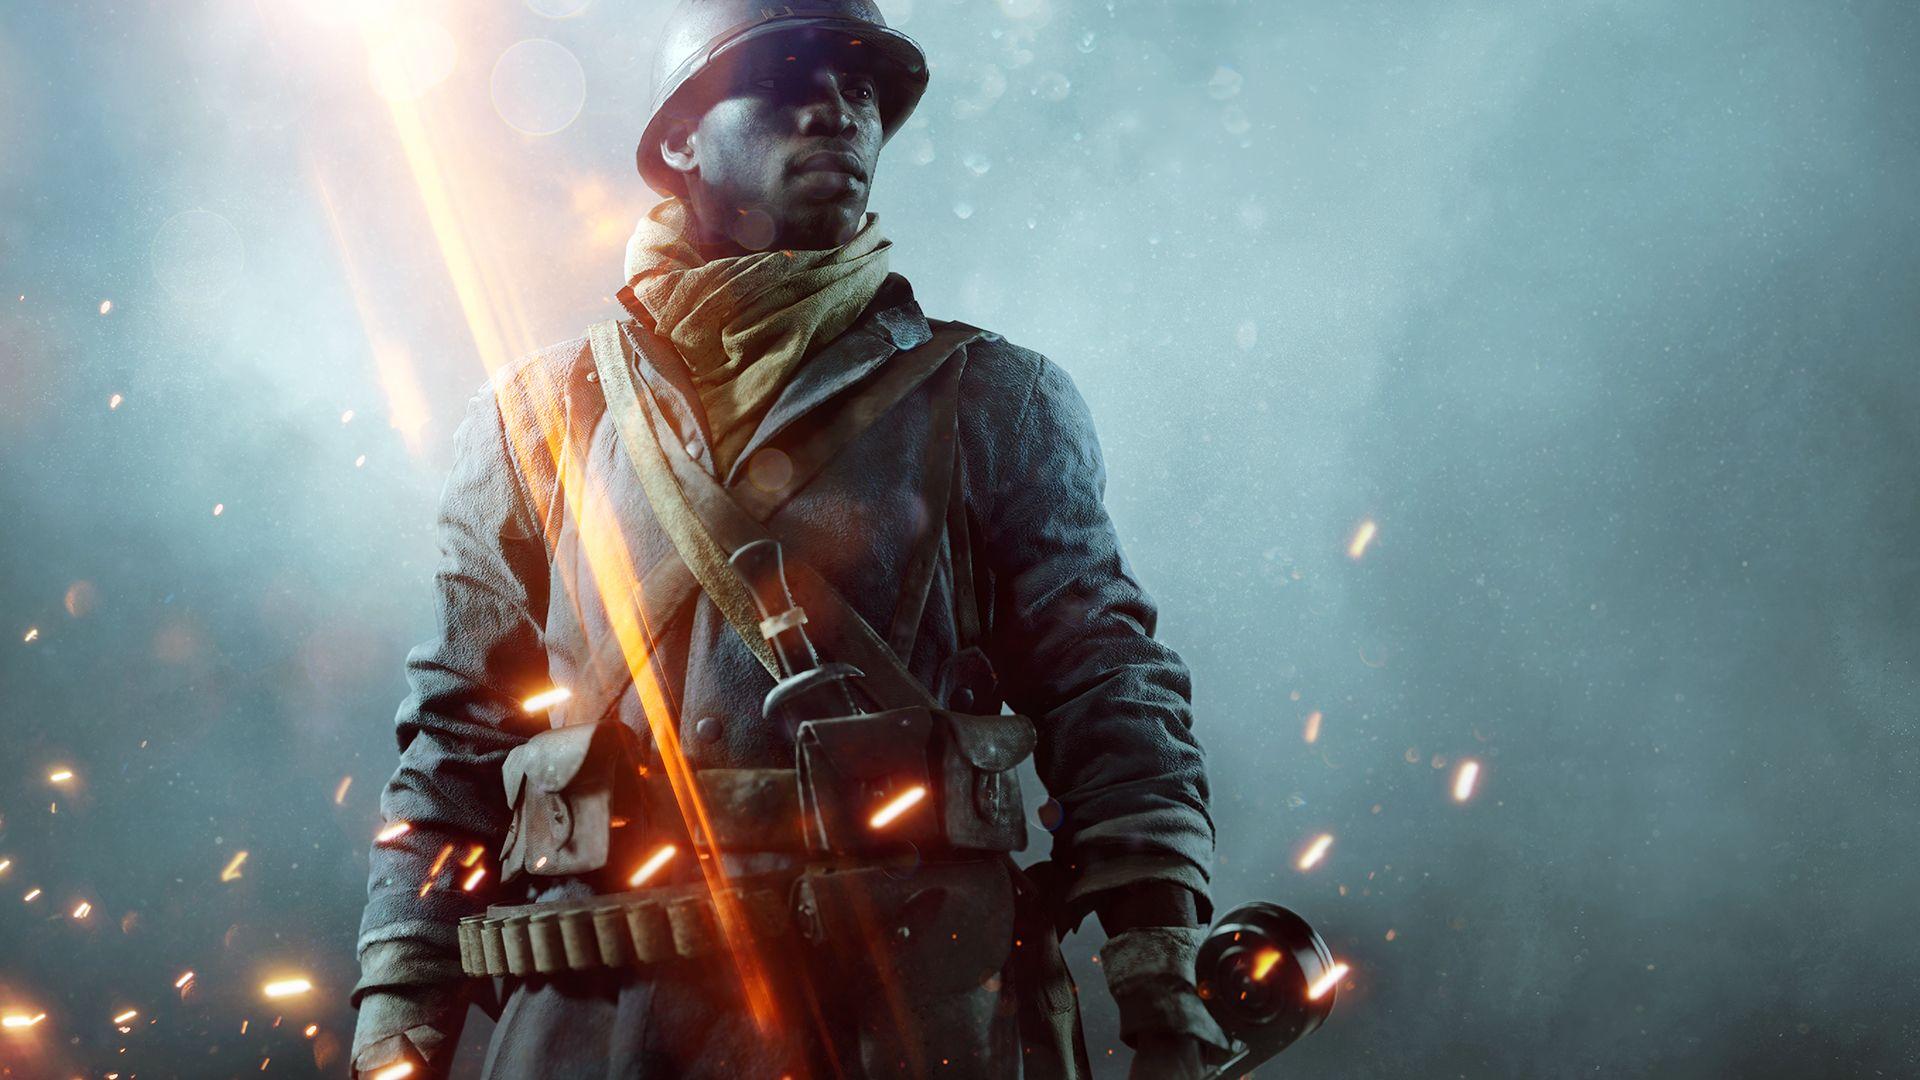 Free Premium pass for Battlefield 1 and Battlefield 4